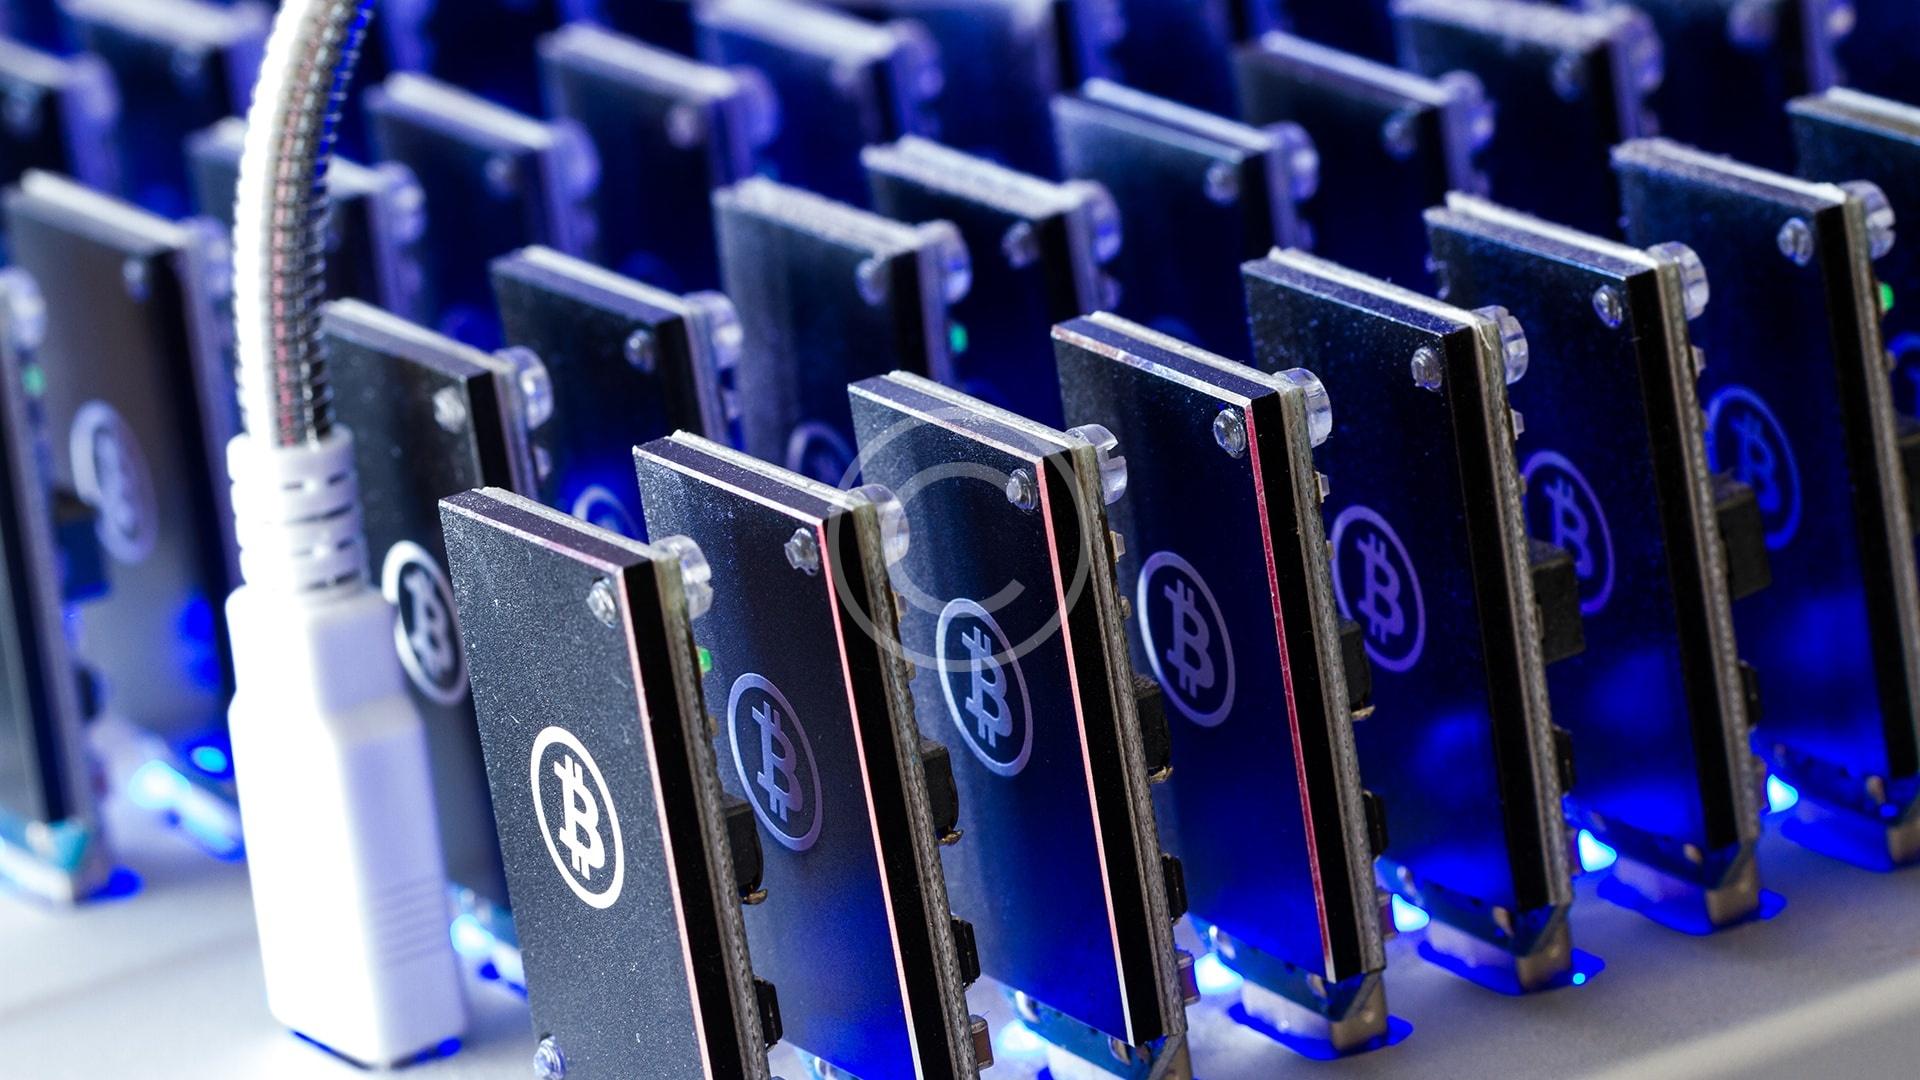 Wallet Encryption